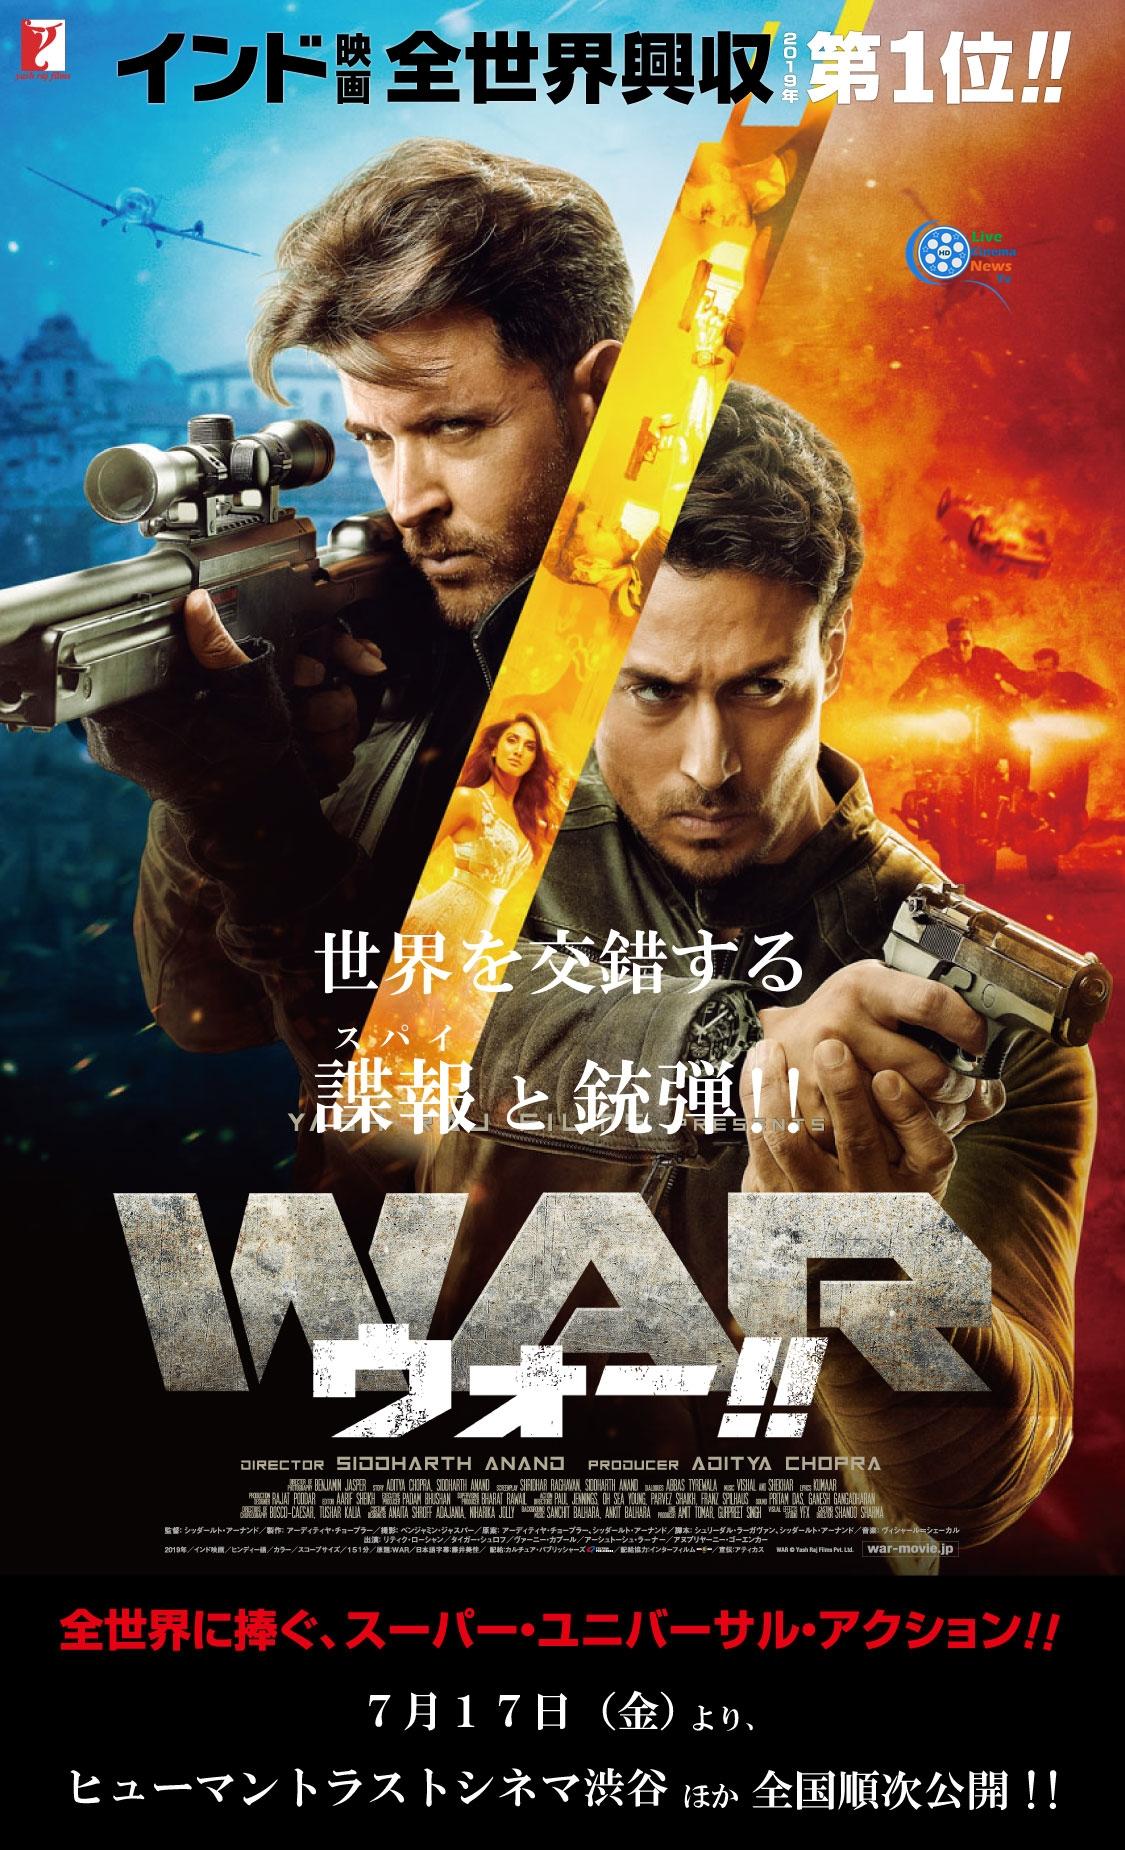 Hrithik Roshan starrer 'War' to be released in Japan soon